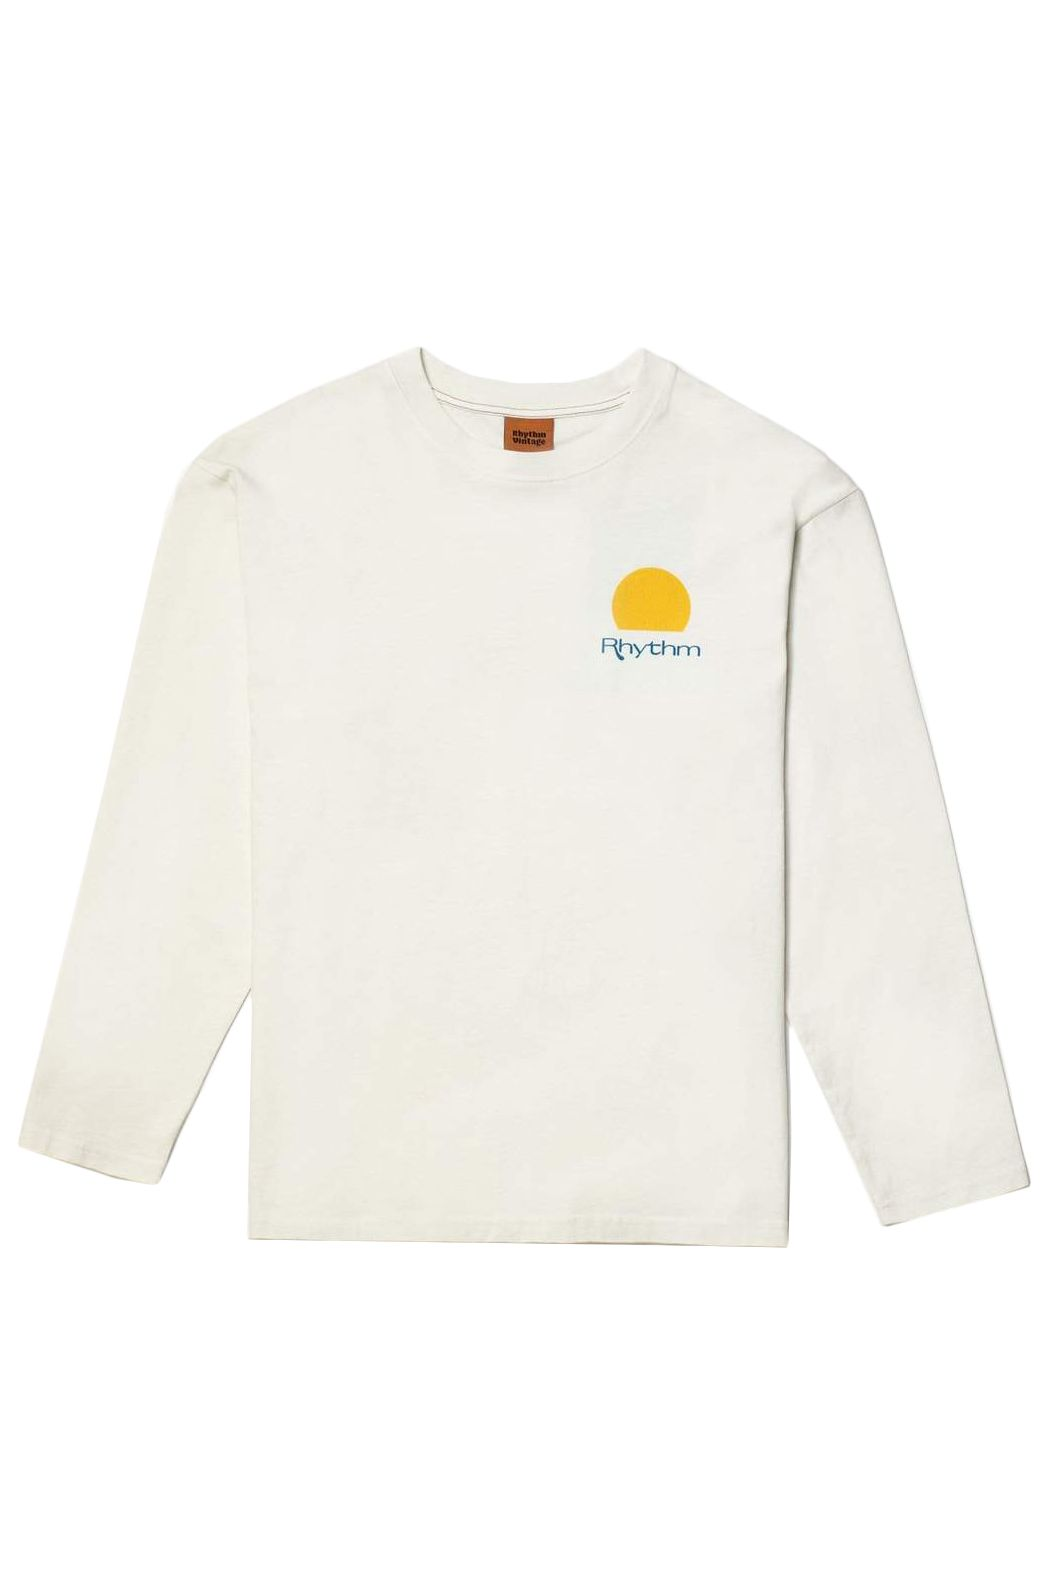 Rhythm L-Sleeve ECLIPSE LS VINTAGE T-SHIRT Vintage White